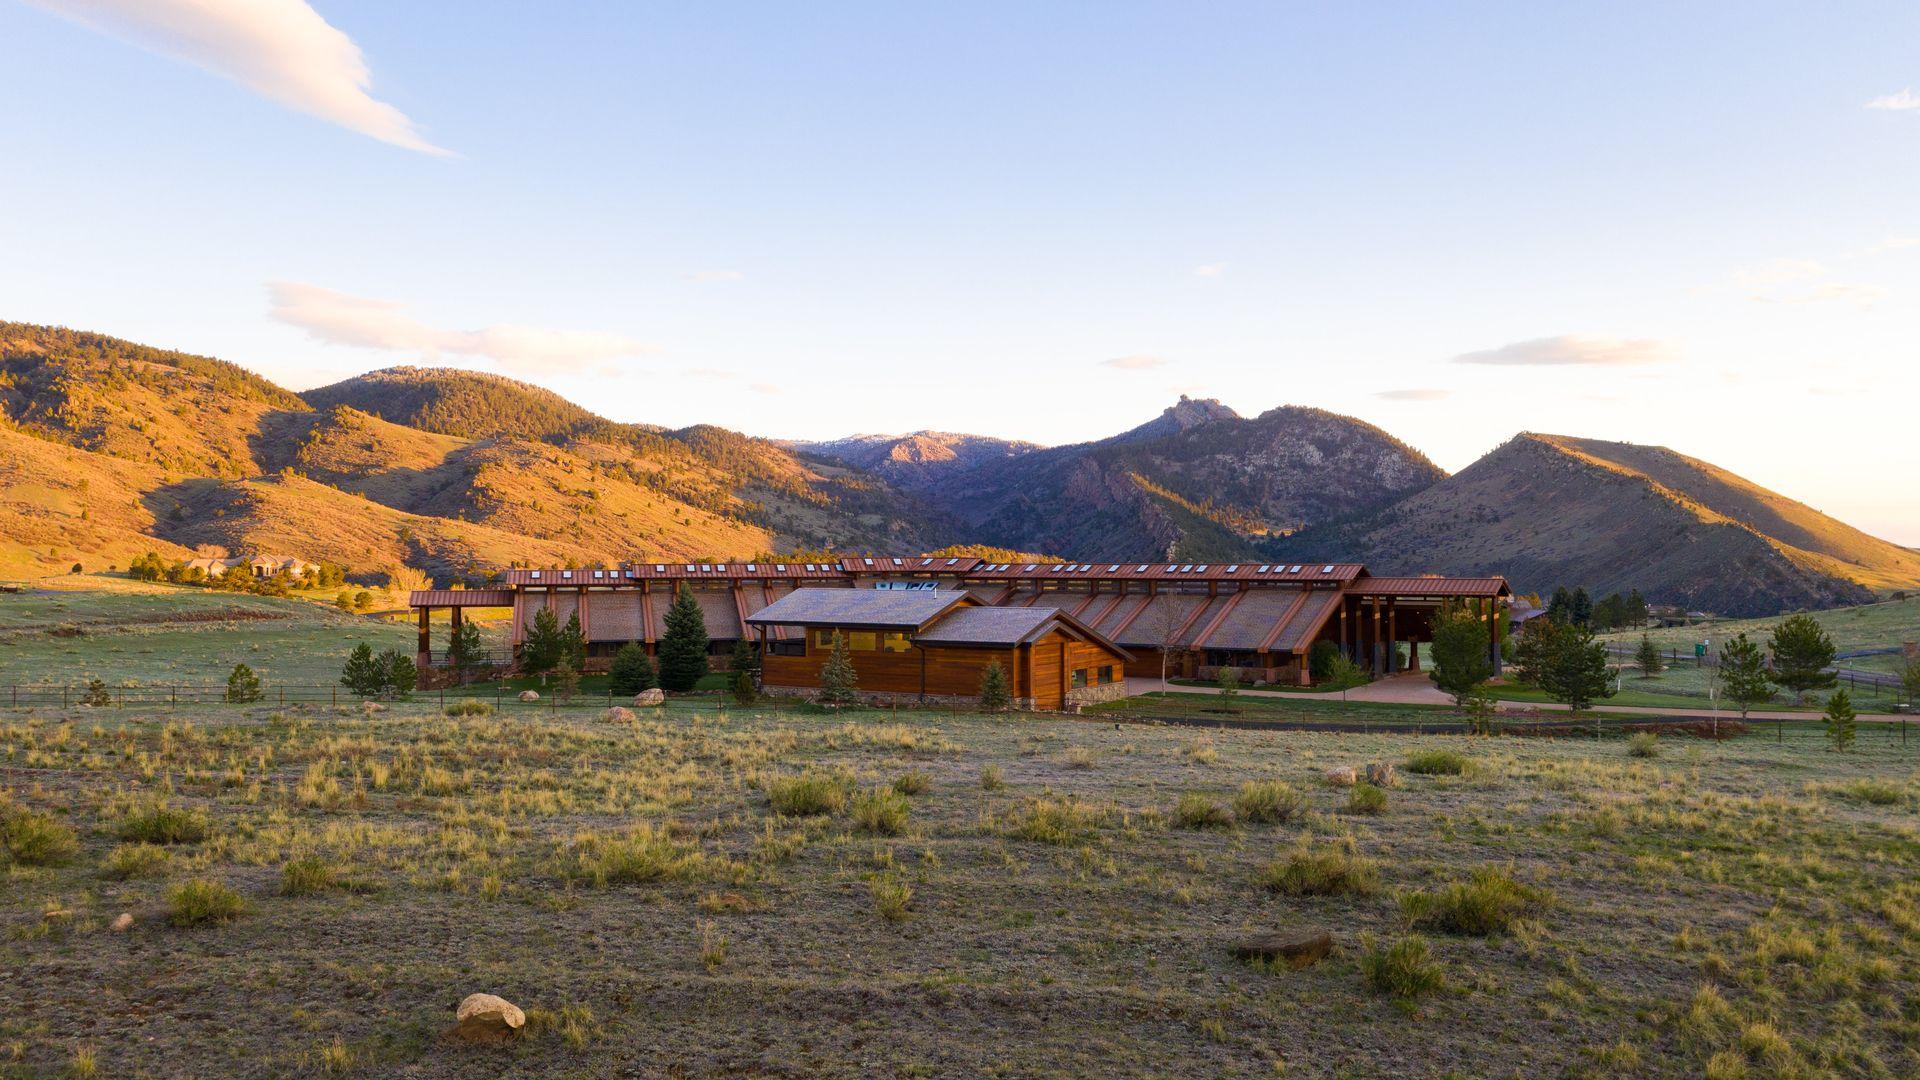 Colorado Mountain house on 35 acres asks $7M